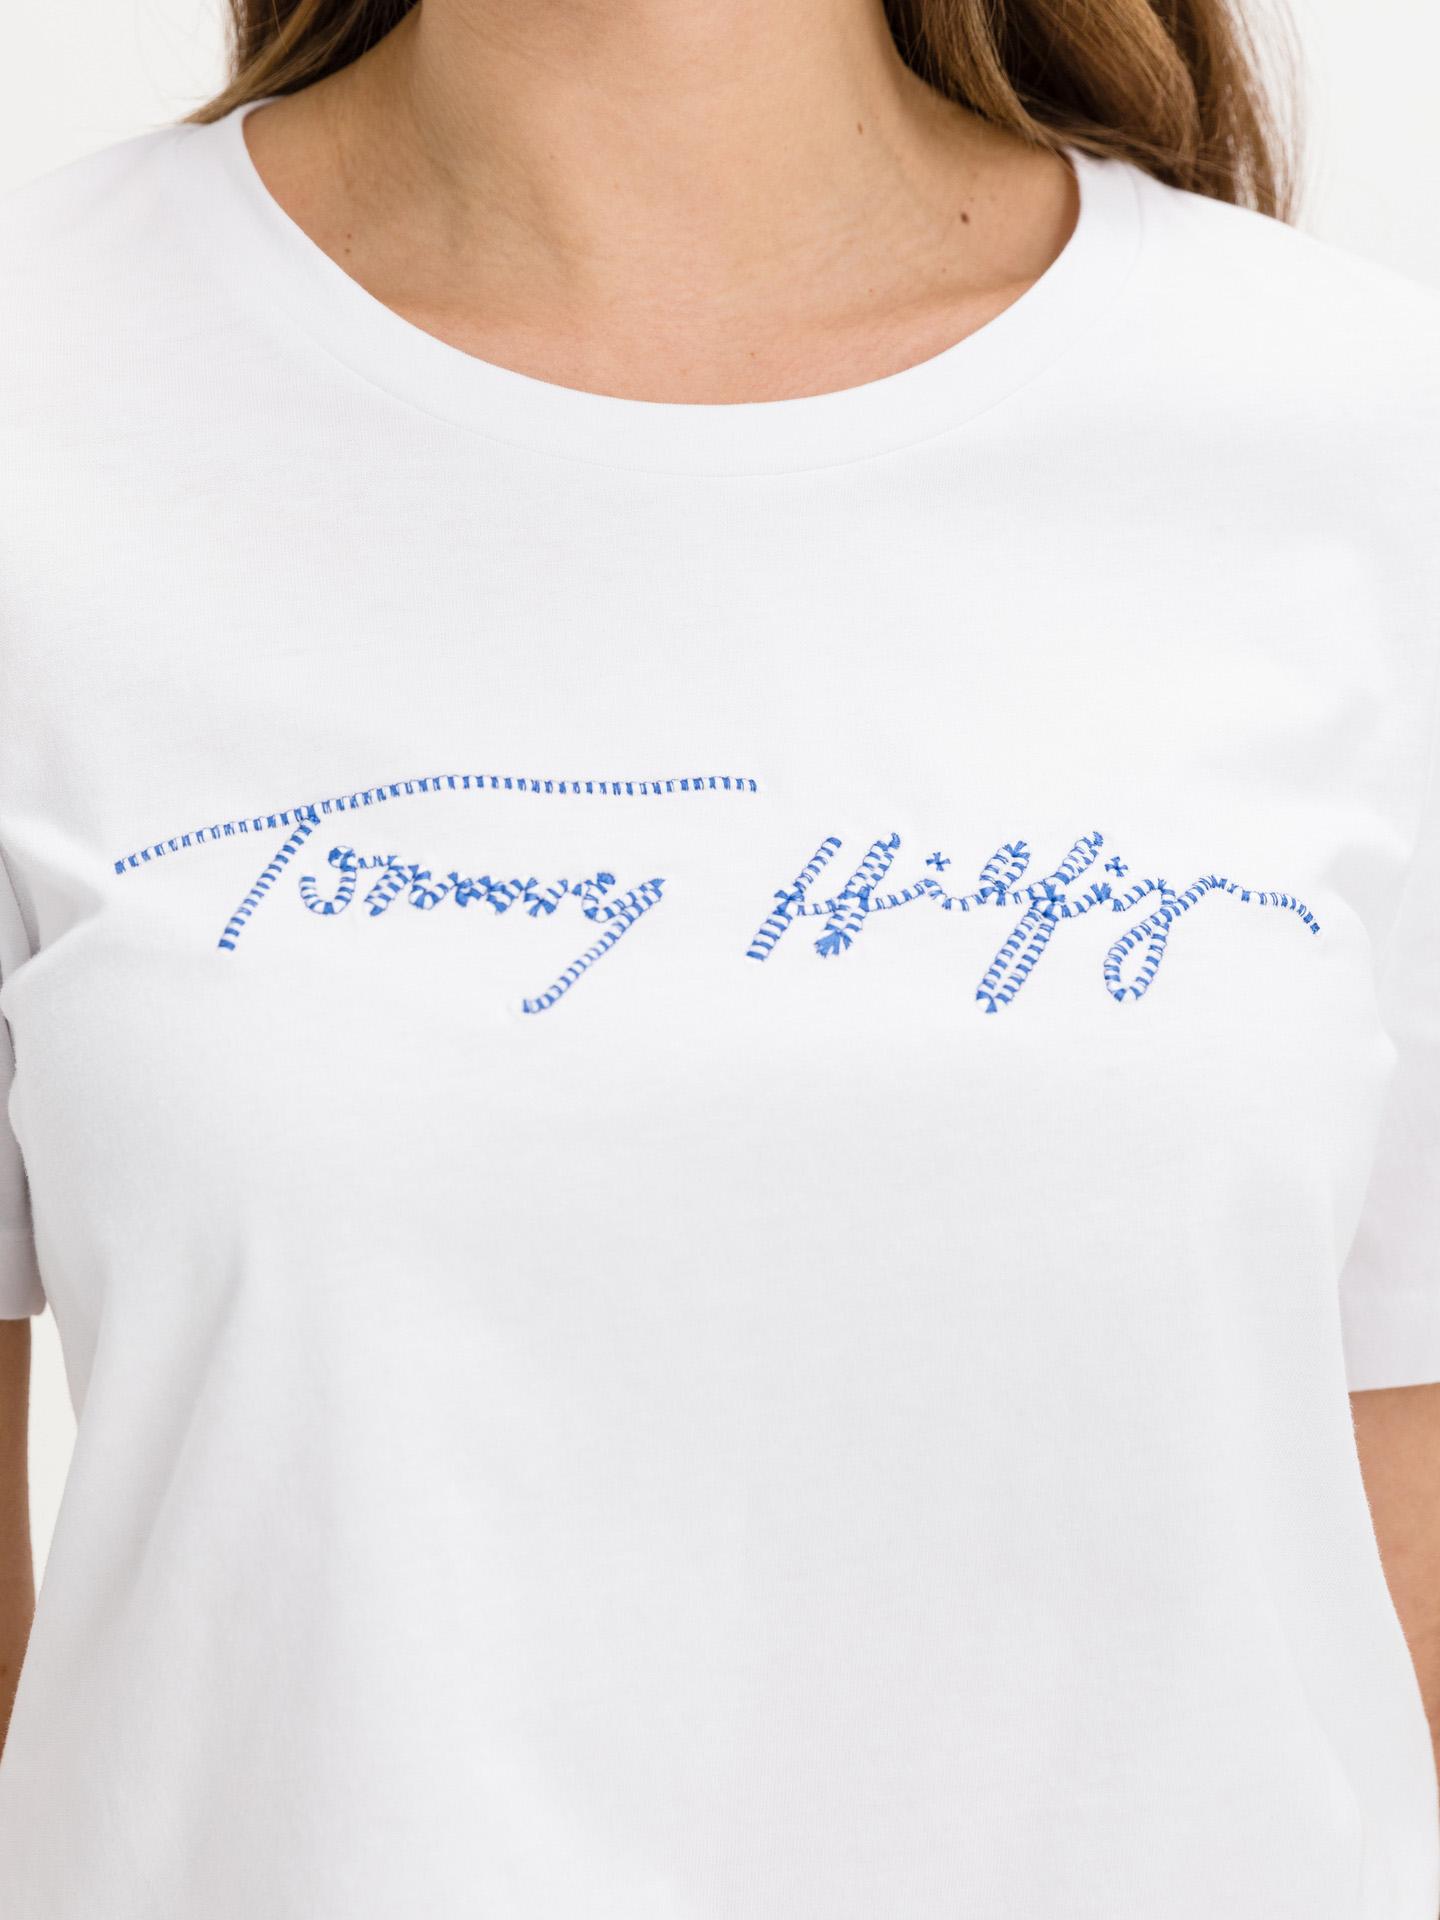 Tommy Hilfiger bianco da donna maglietta